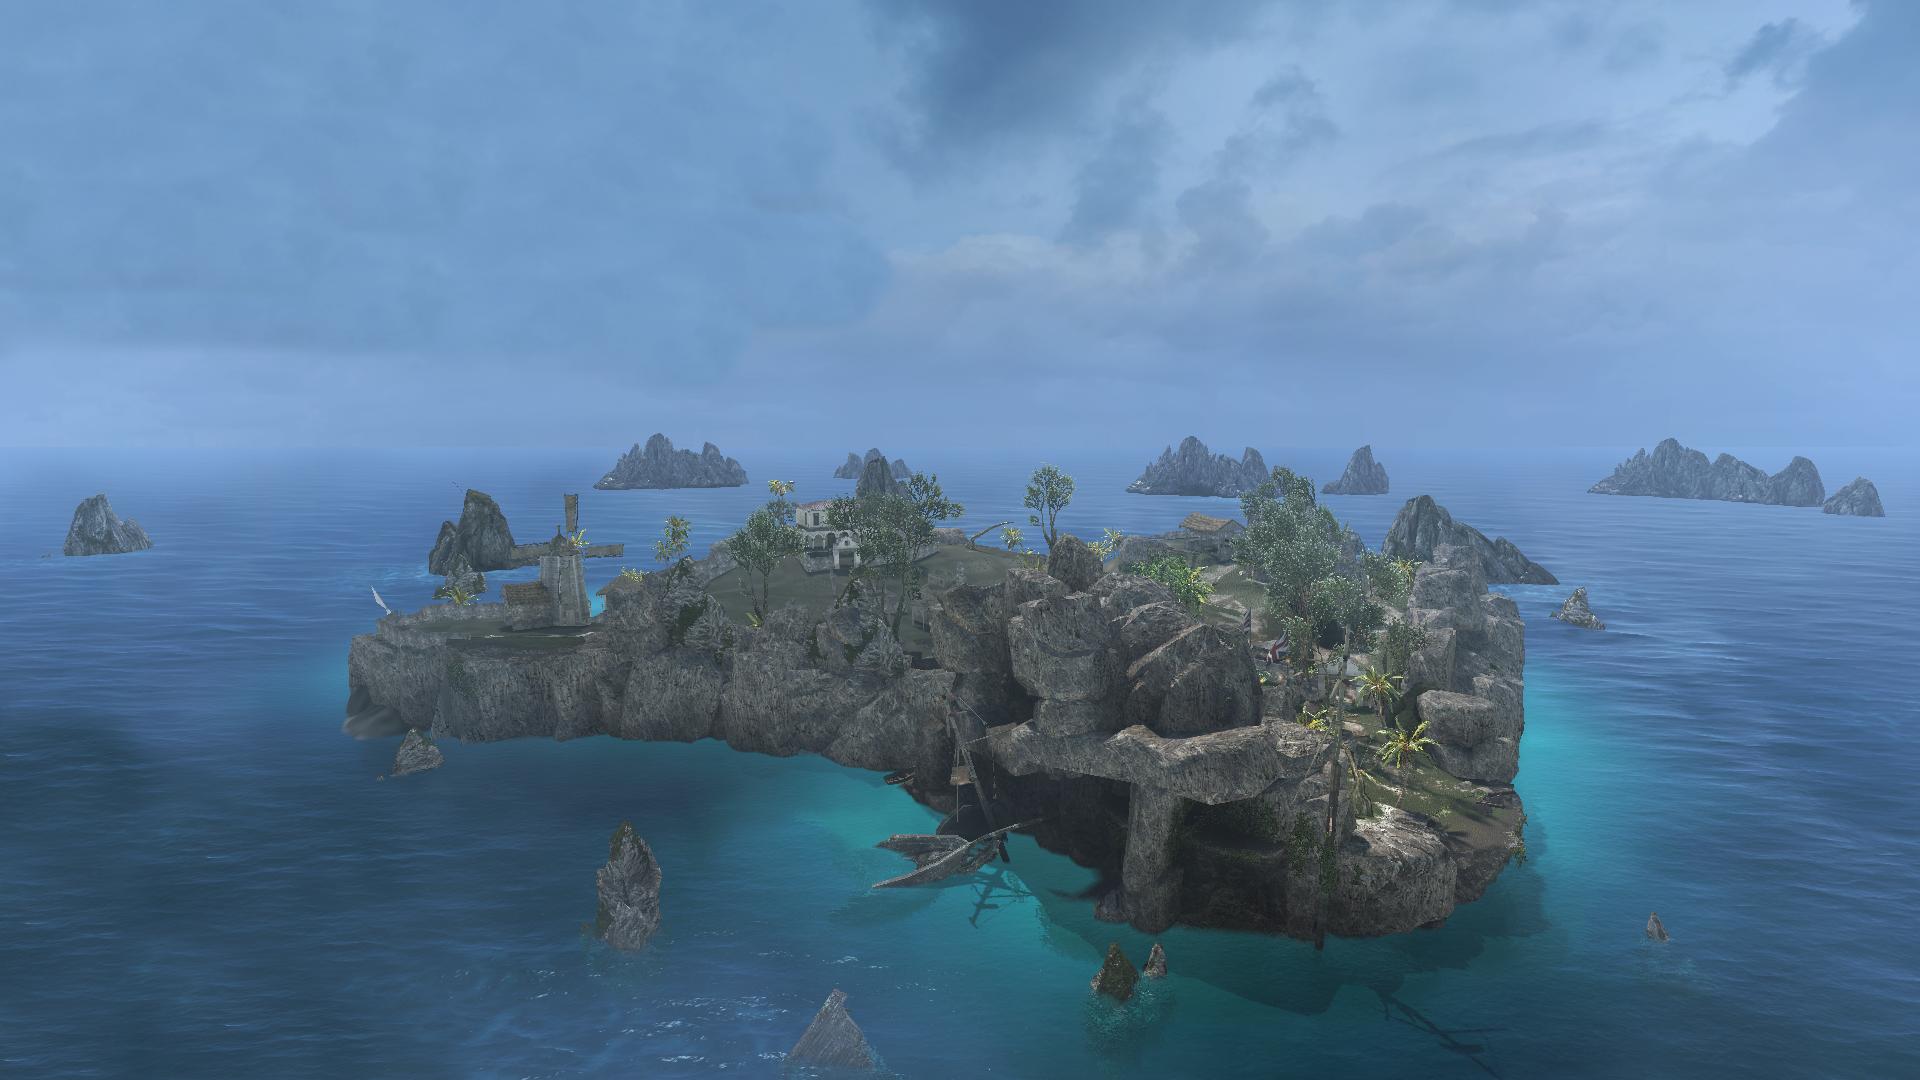 Isola Nera - Assassin's Creed Wiki